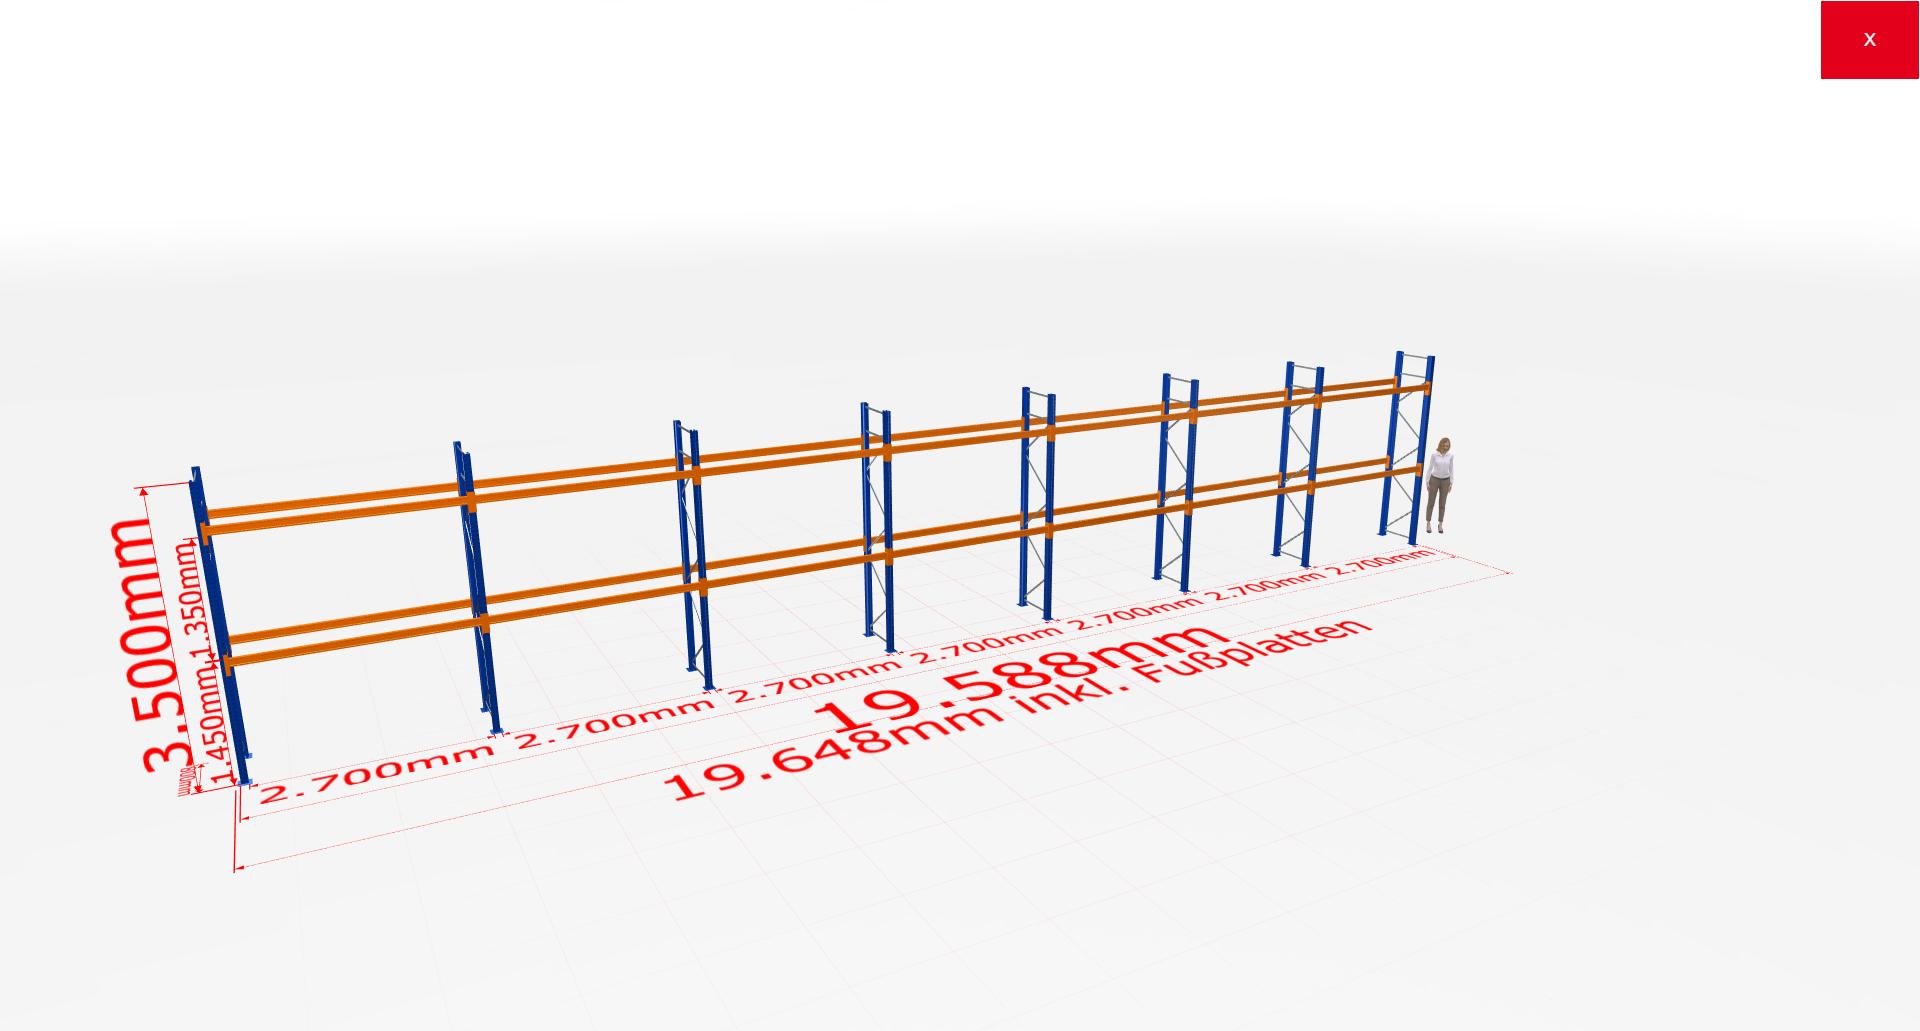 Palettenregal Komplettregal 3500x19588x800 mm (HxBxT) 2 Fachebenen SCHULTE Lagertechnik